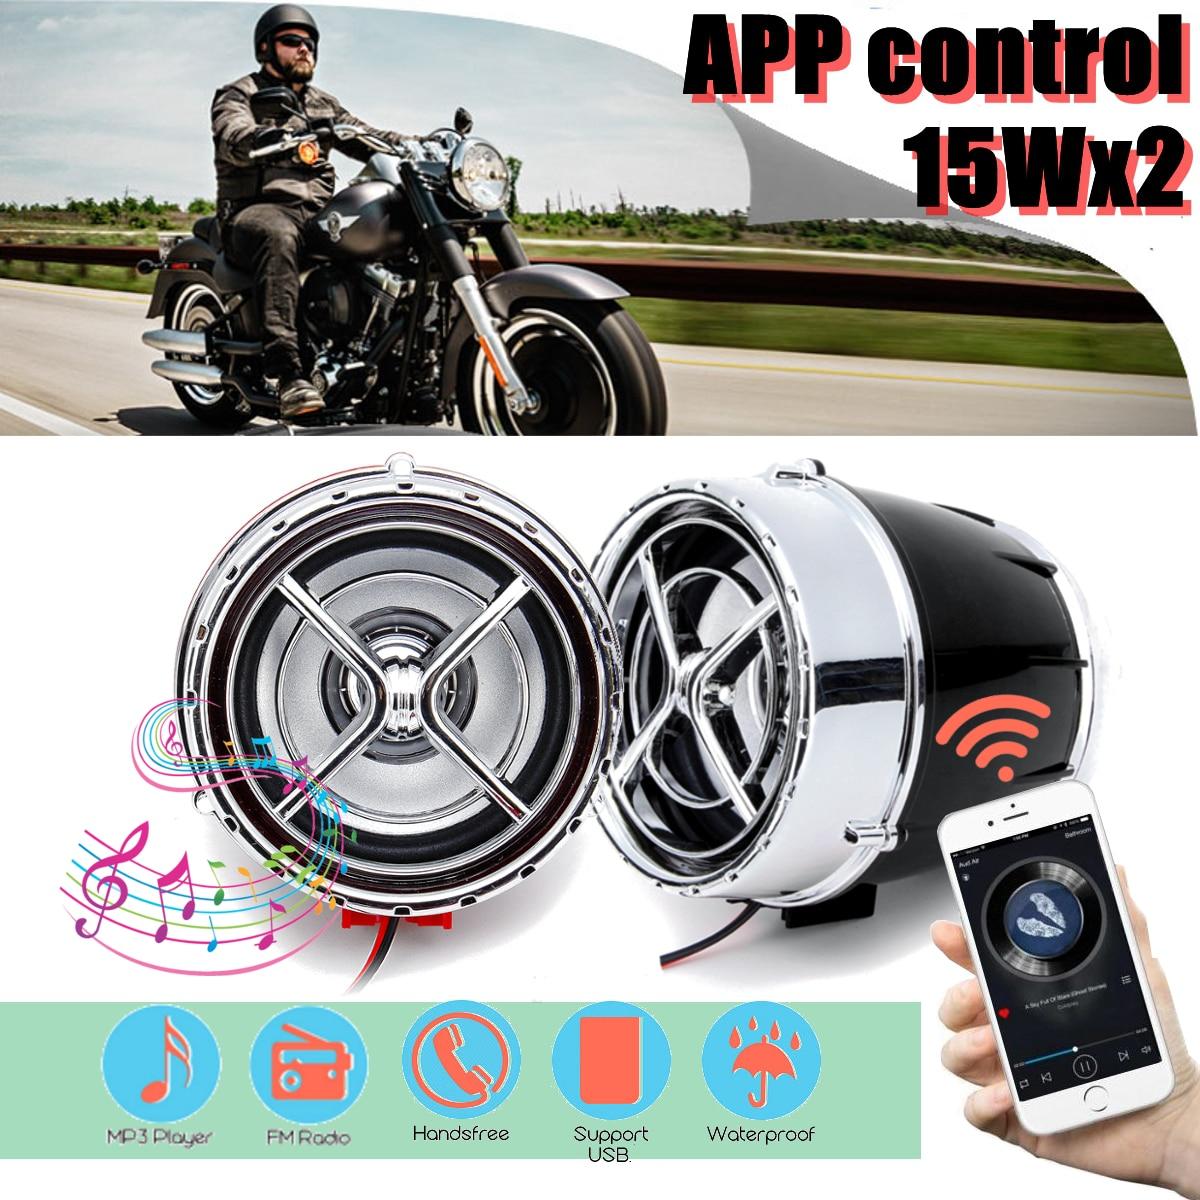 12 V Çift bluetooth motosiklet bisiklet Multimedya MP3 Çalar Hoparlörler Ses FM Radyo Güvenlik Alarm Kablosuz APP Uzaktan Kumanda